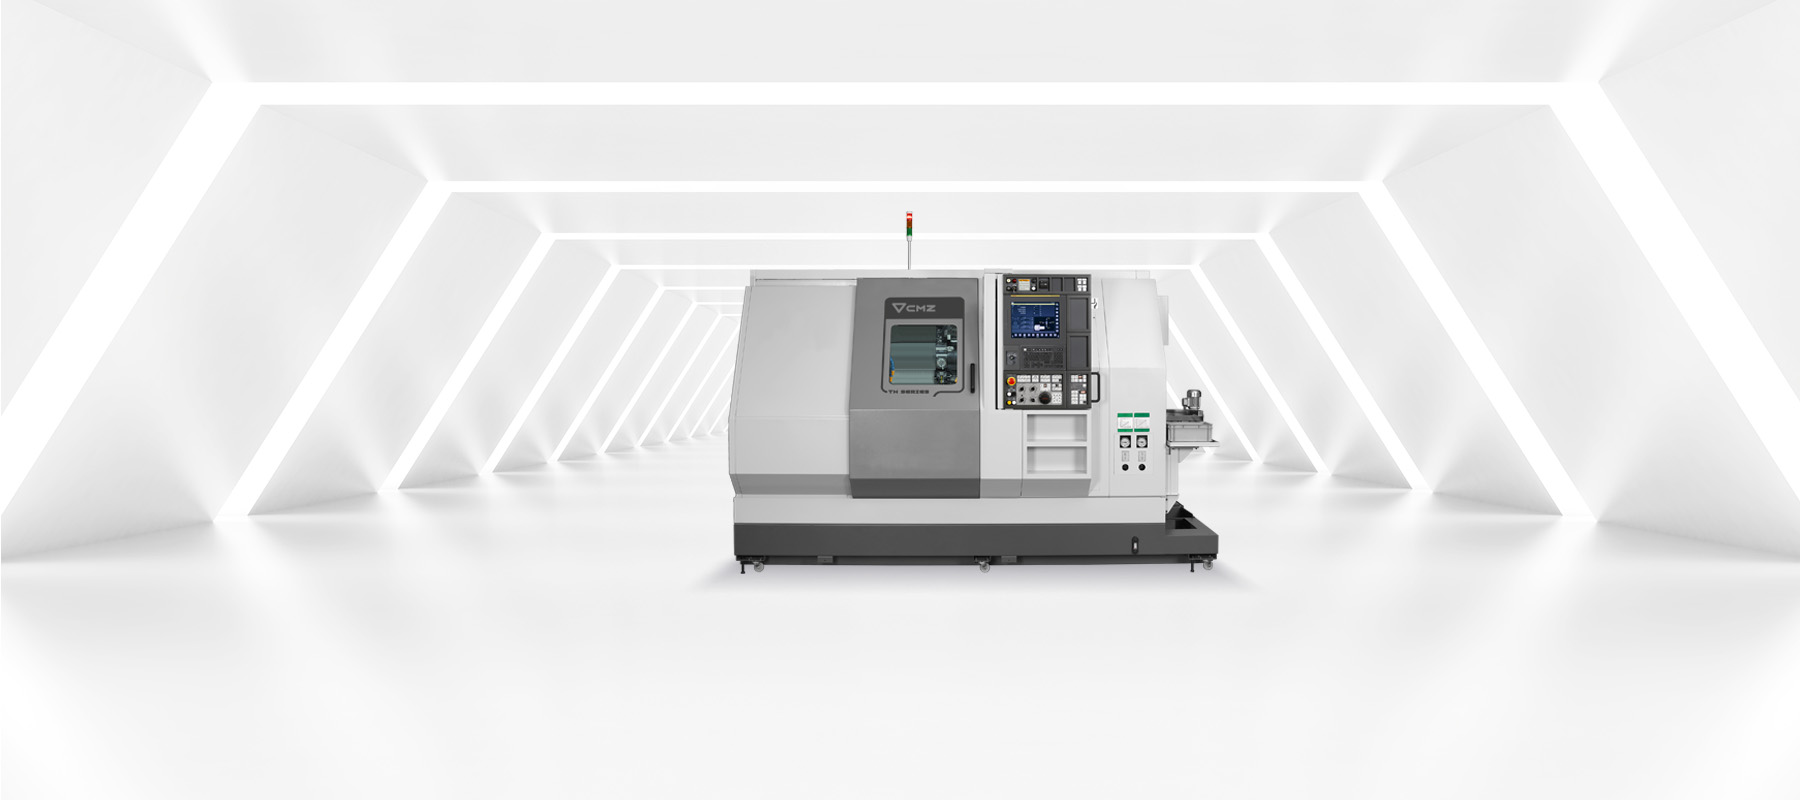 Torno CNC TX66 Y2